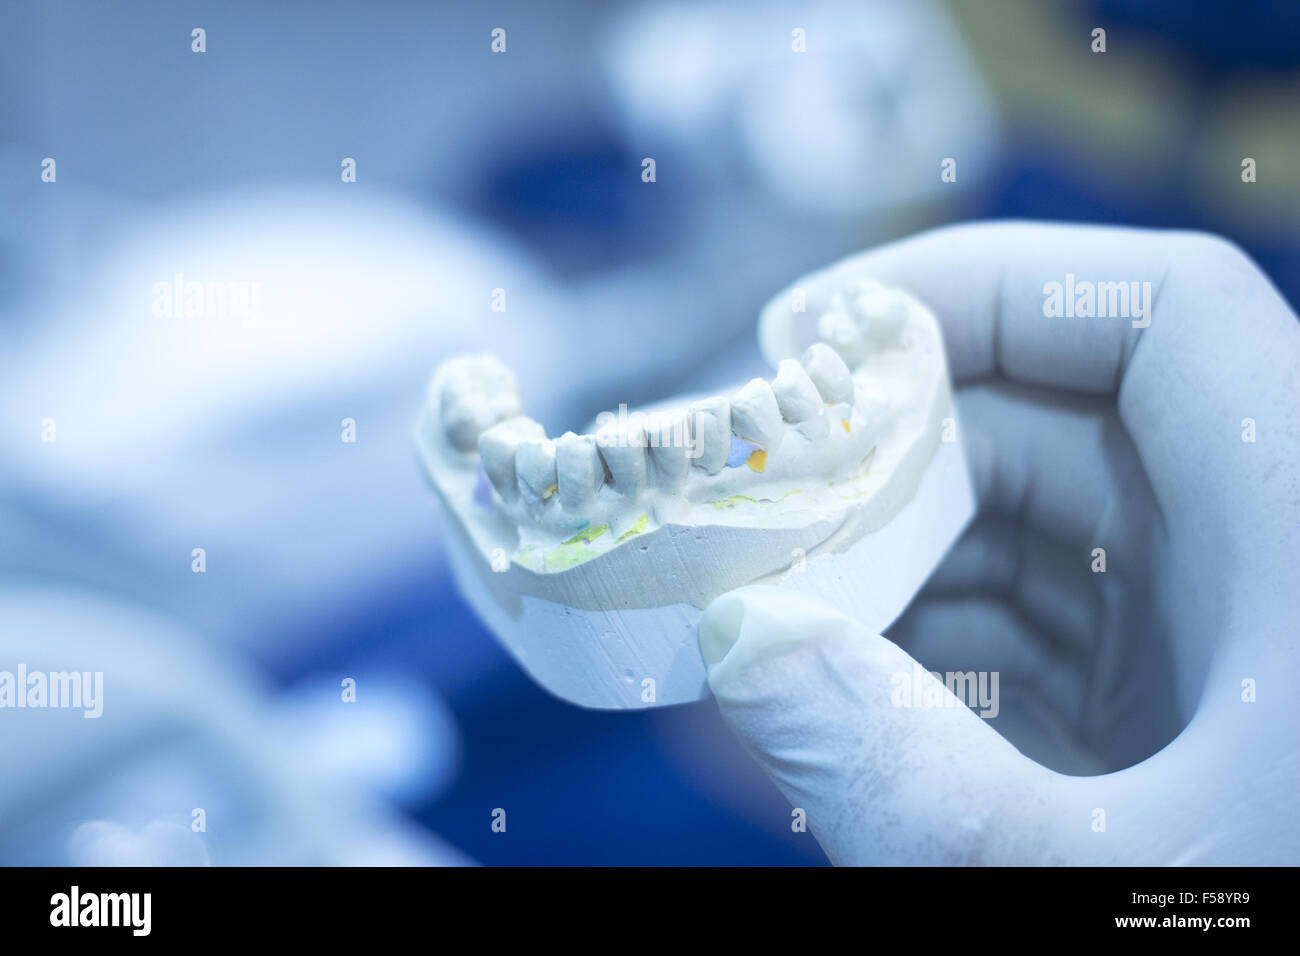 Dental mold dentist clay teeth plate ceramic cast model showing